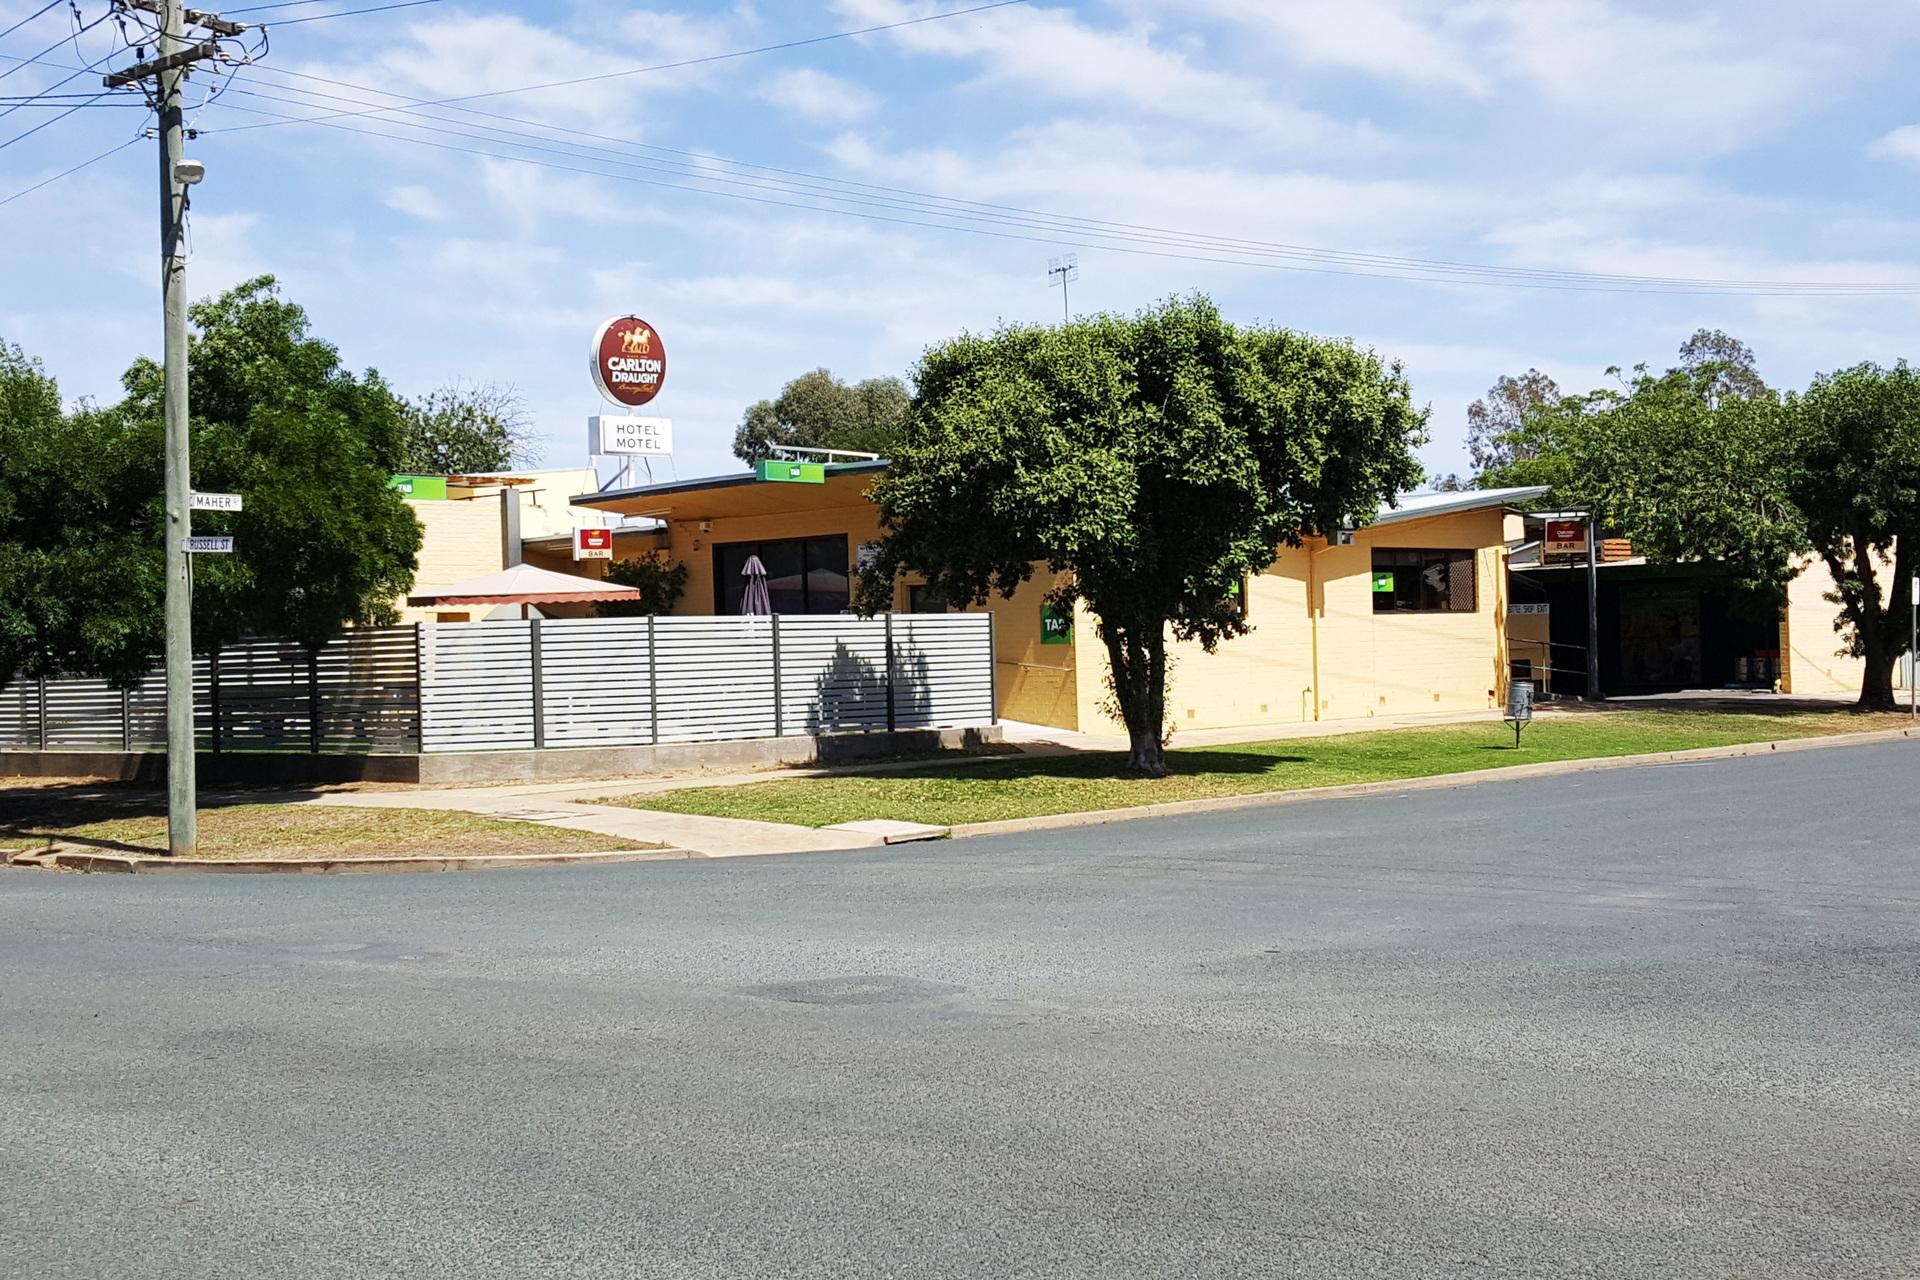 m - White Lion Hotel Motel